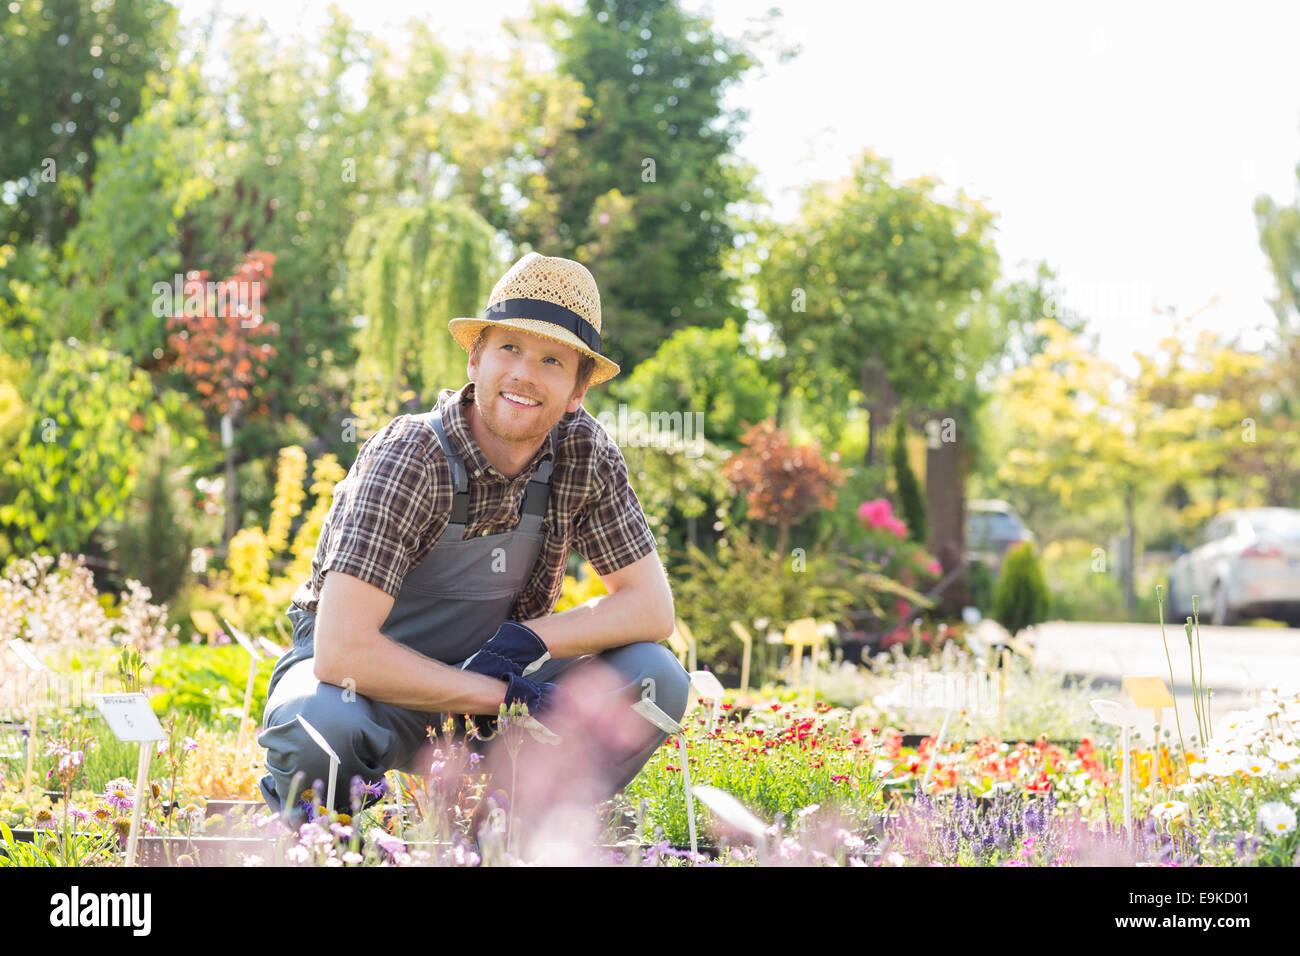 Man looking away while gardening at plant nursery - Stock Image